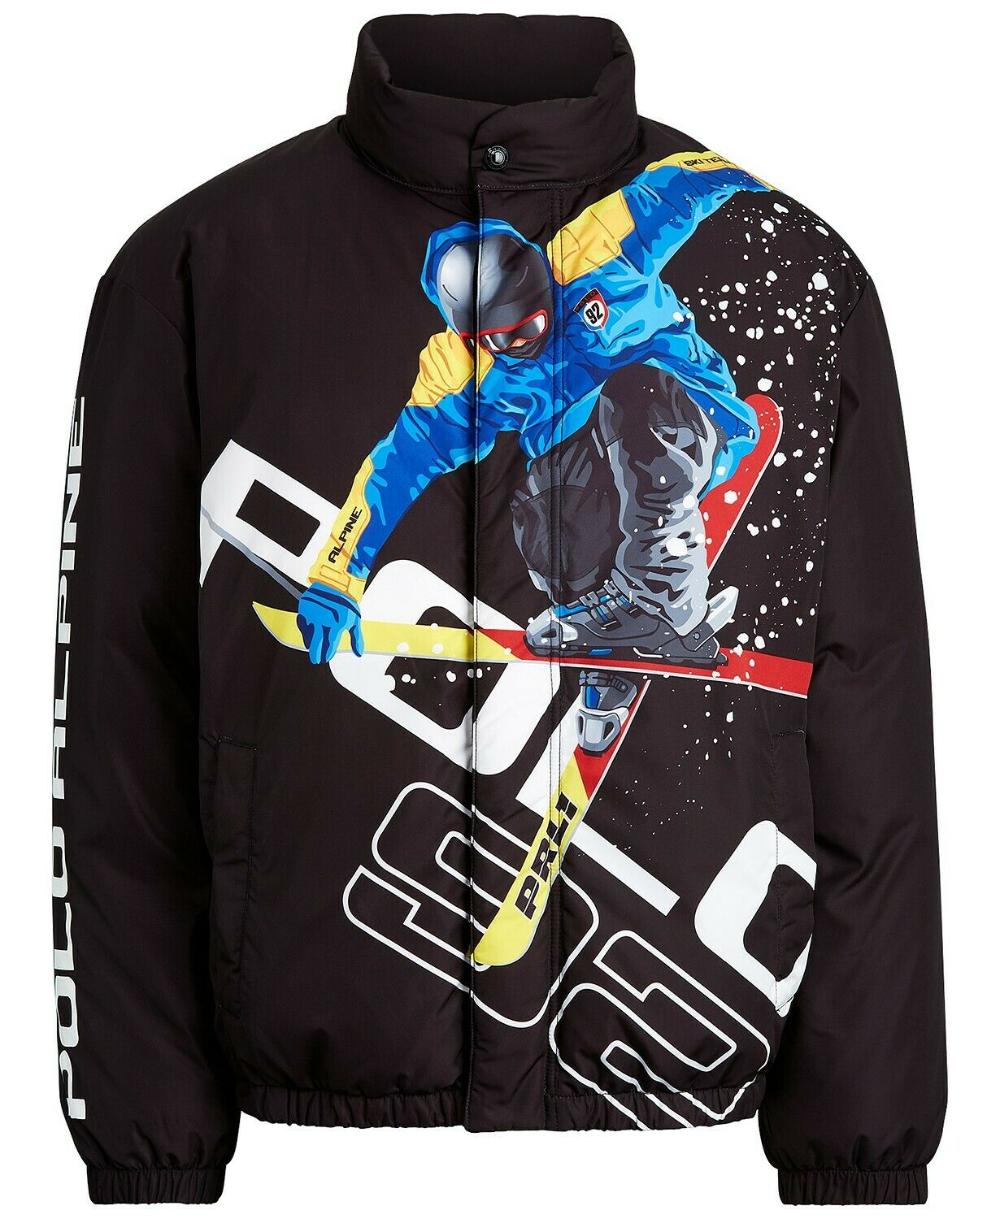 Polo Ralph Lauren Alpine Ski 92 Downhill Skier Down Jacket